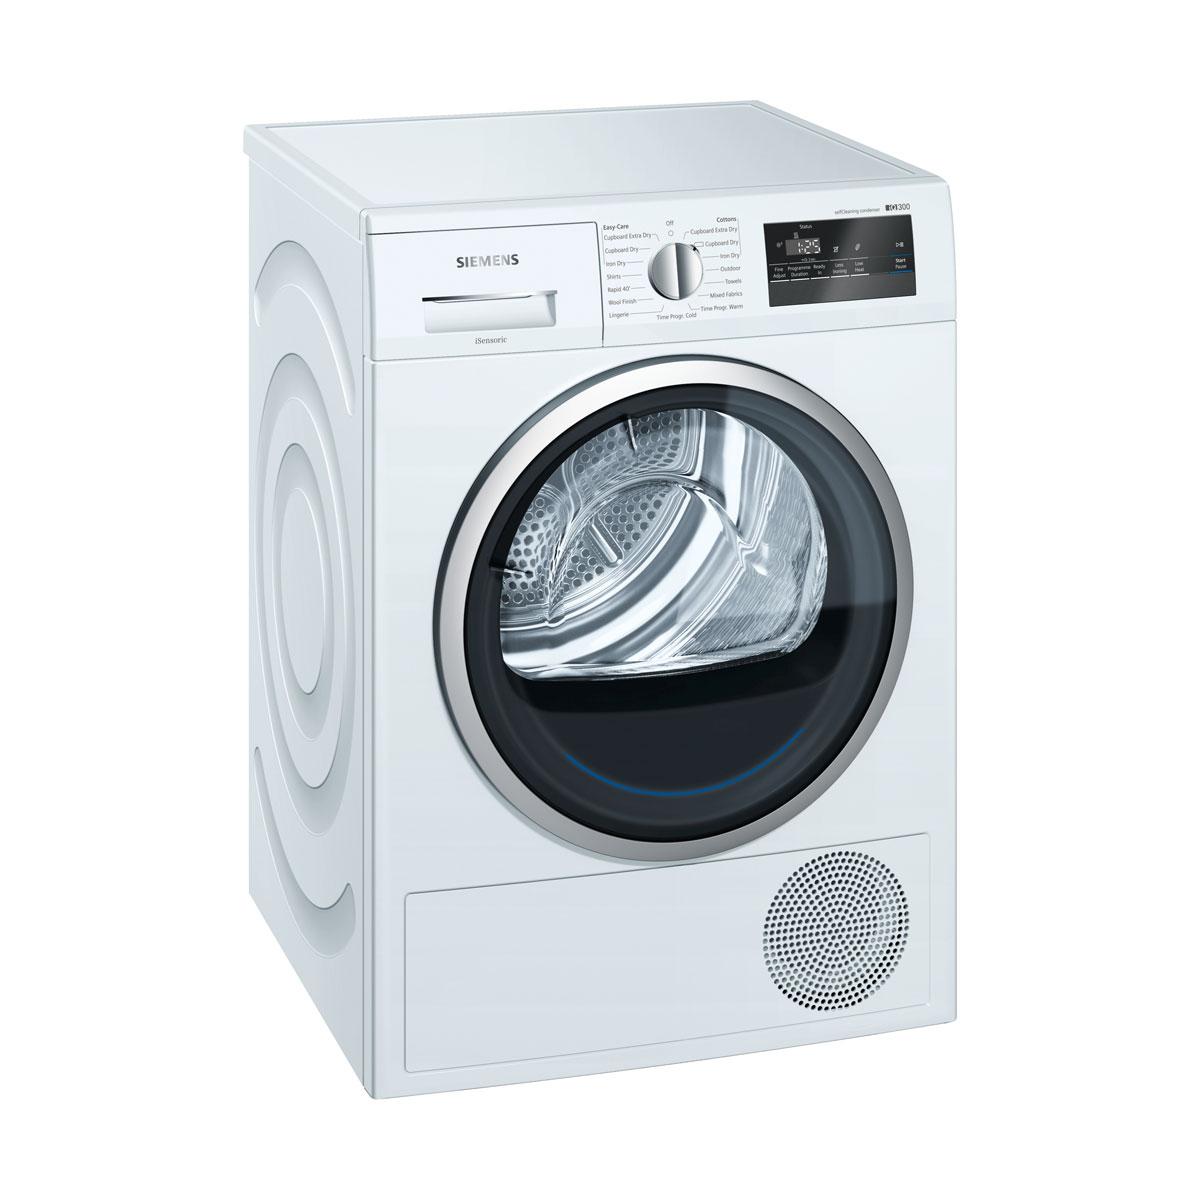 An image of WT45M232GB 8kg Heat Pump Tumble Dryer